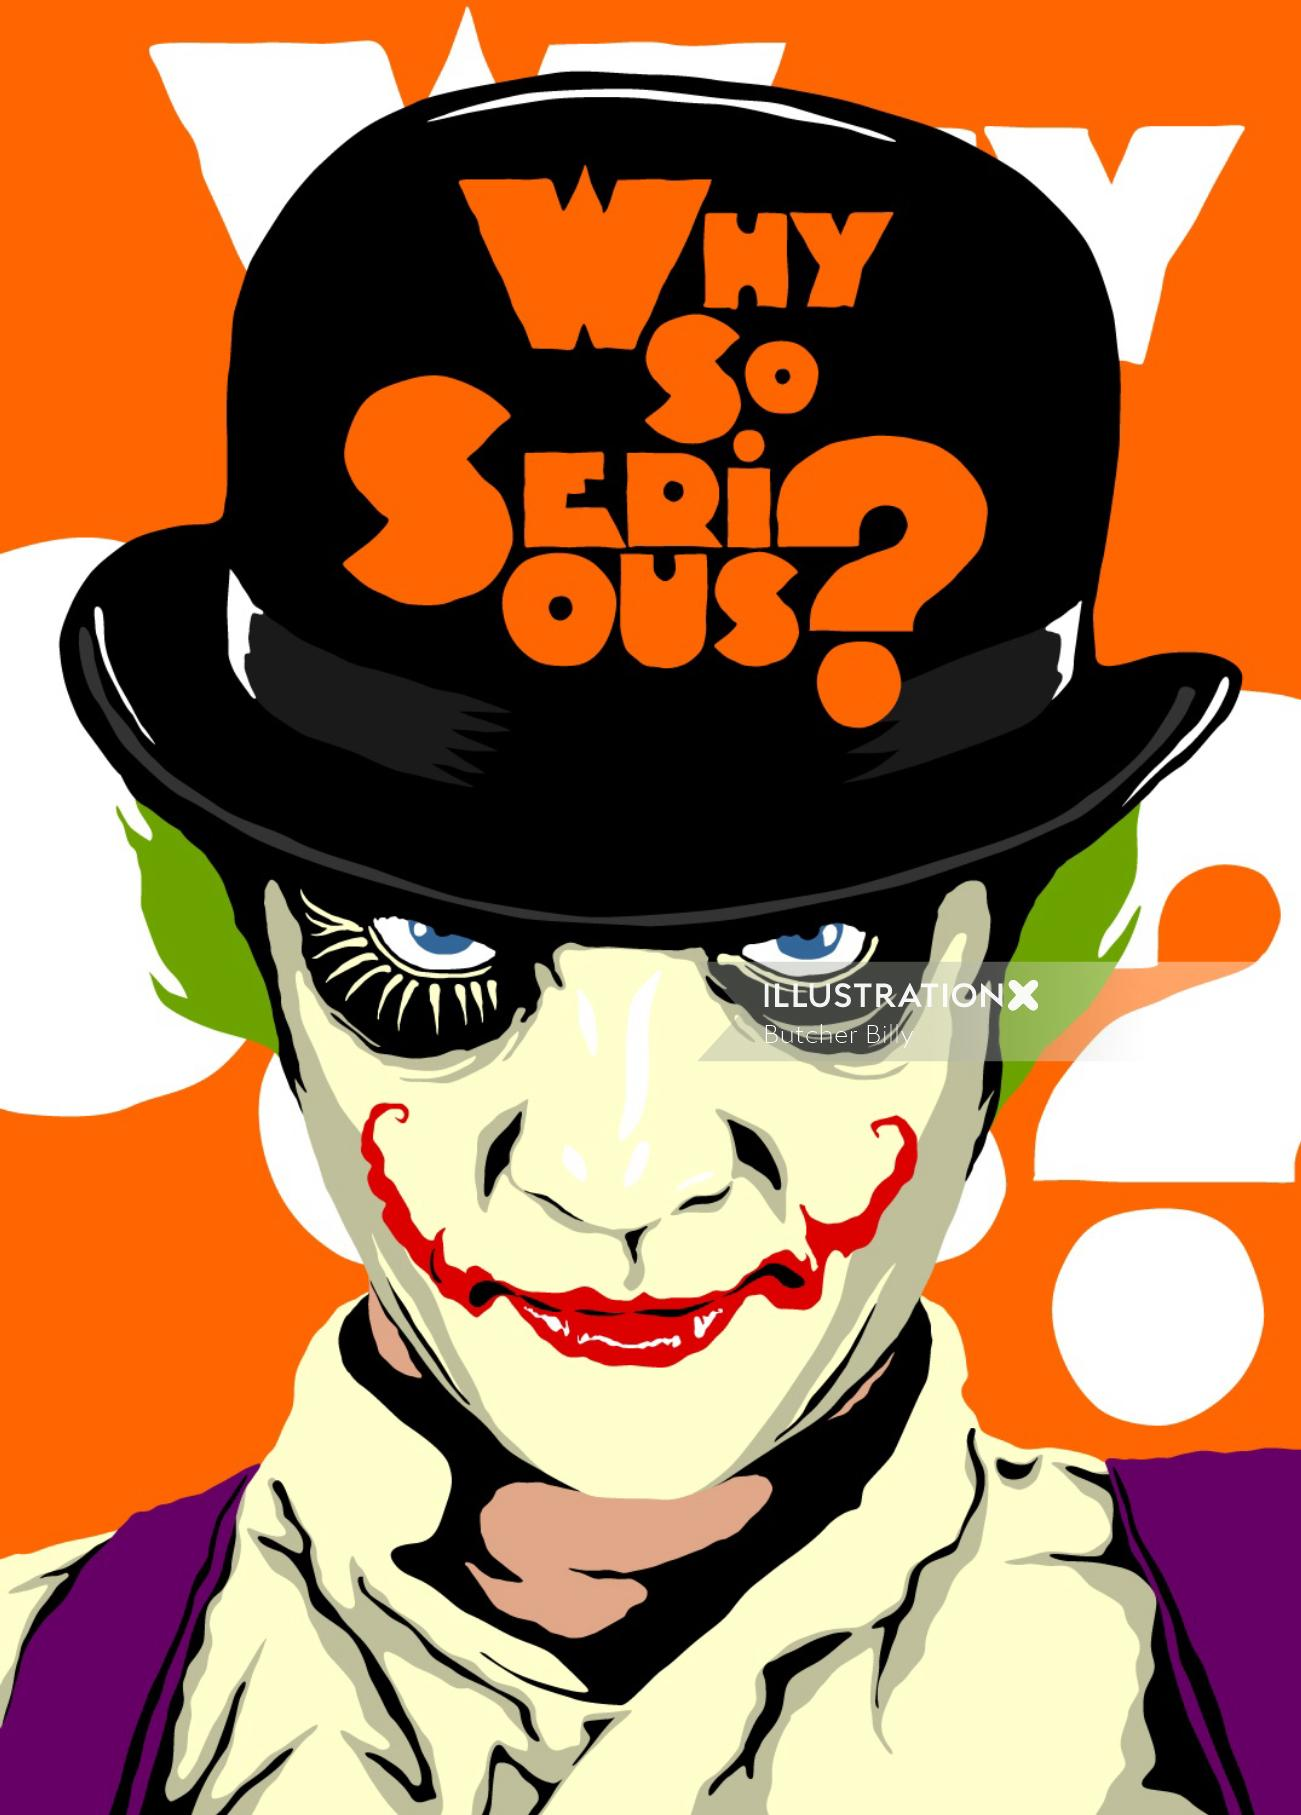 Pop Art of Clockwork Joker